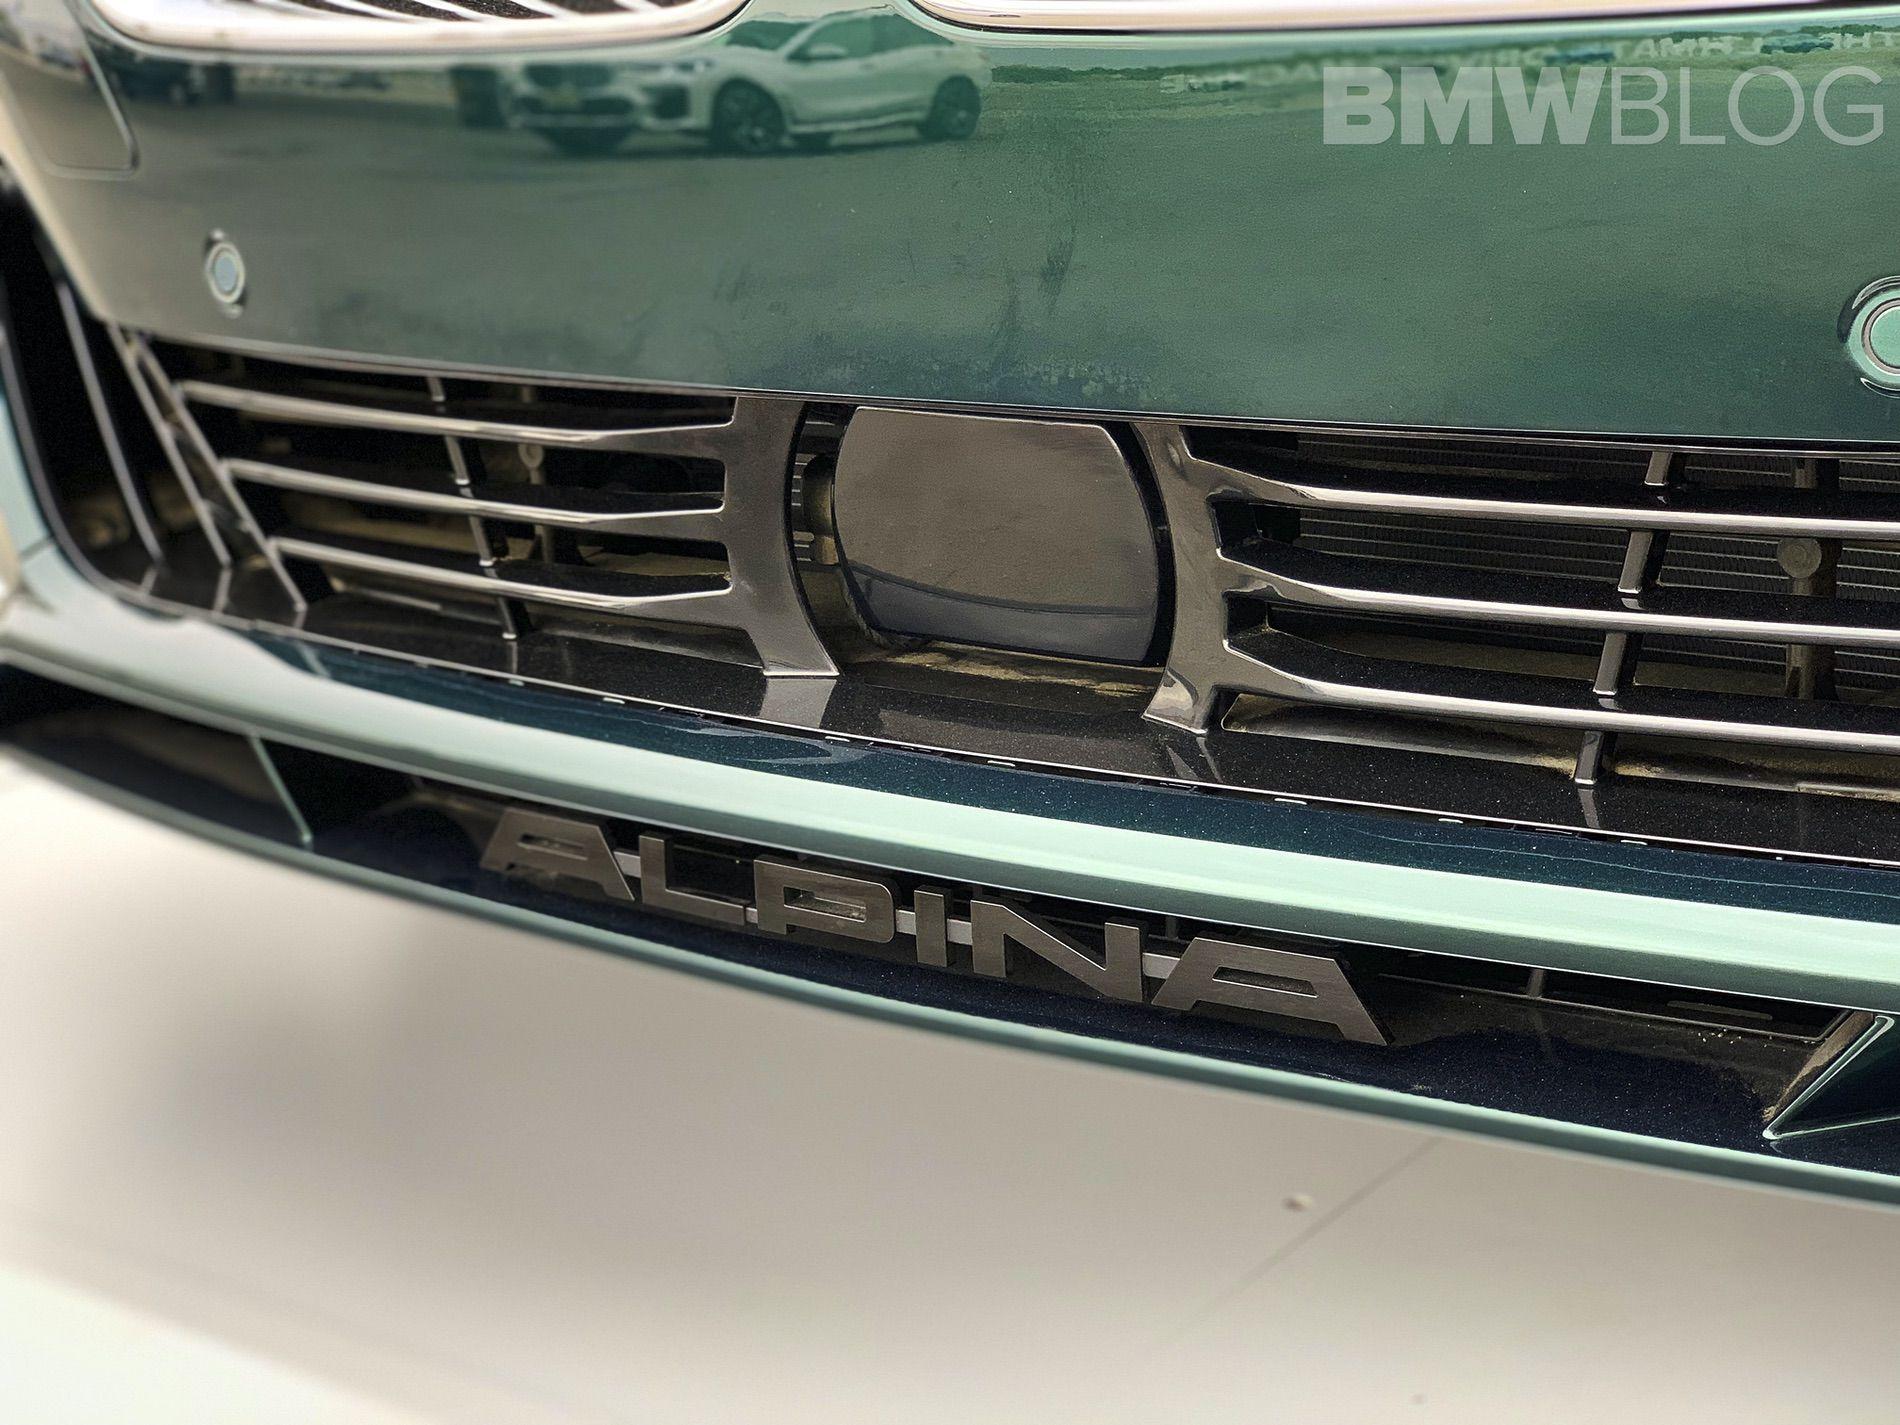 2019 - [BMW] Série 7 restylée  - Page 12 2020-ALPINA-B7-Facelift-02